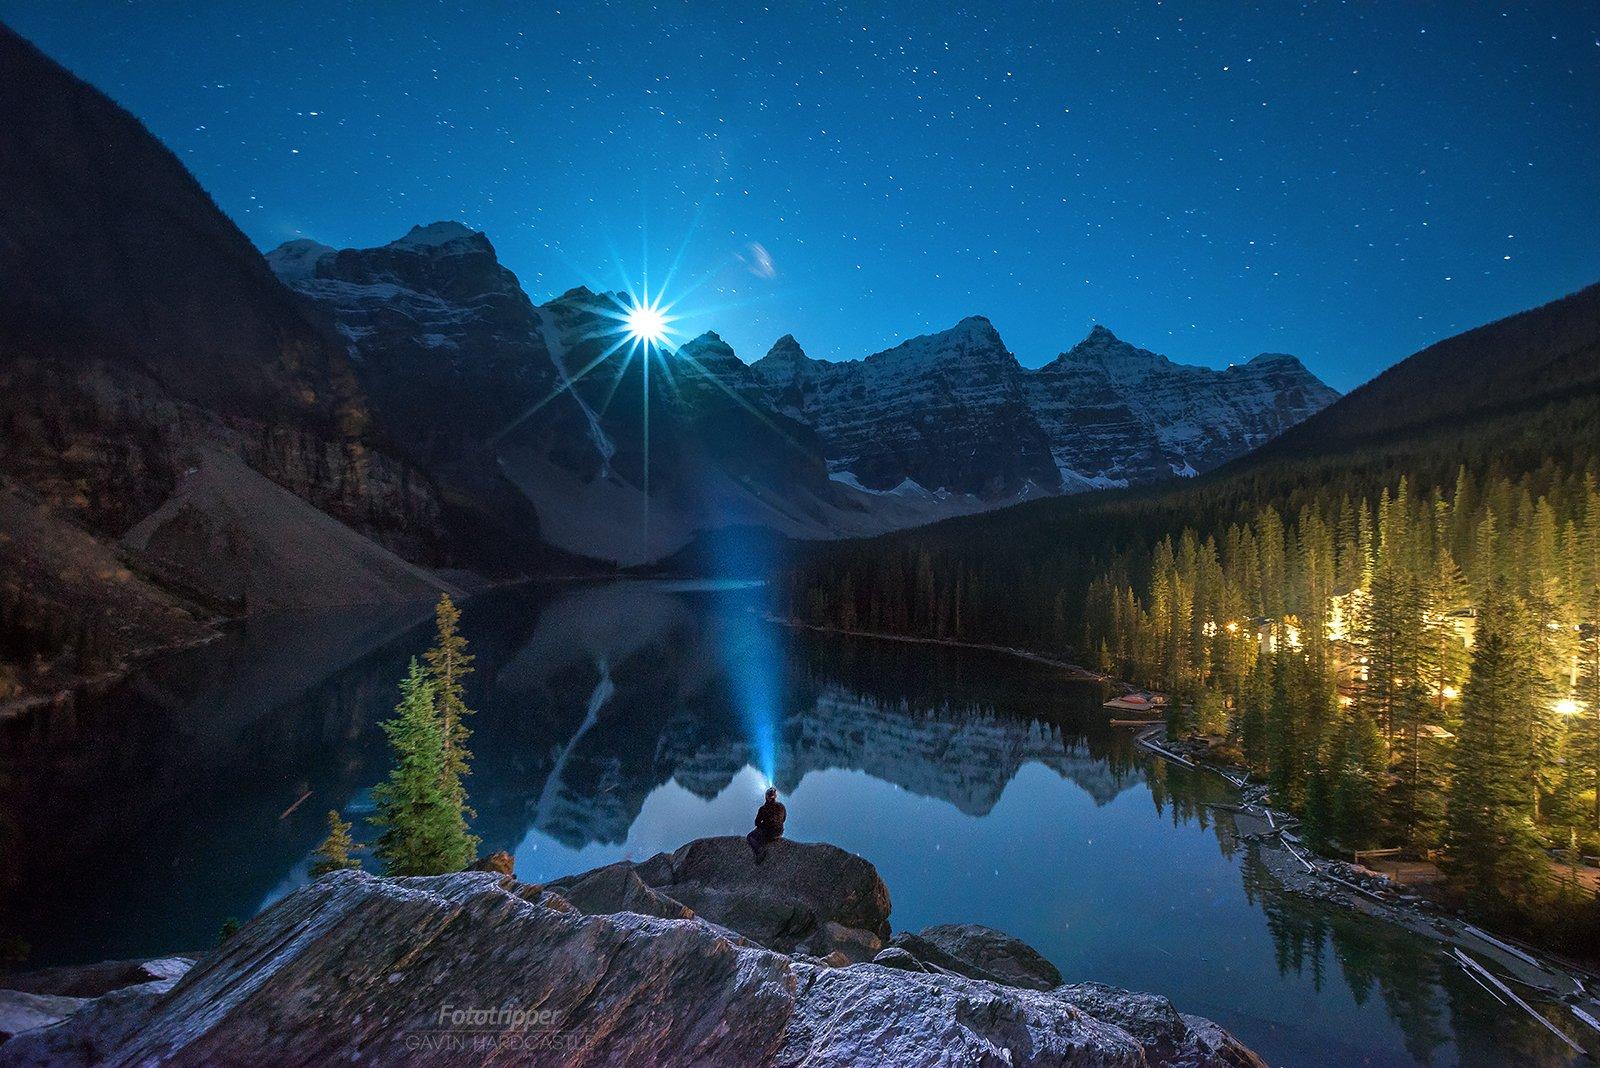 Moraine Moonset   4K Desktop Background of Banff   Fototripper 1600x1068